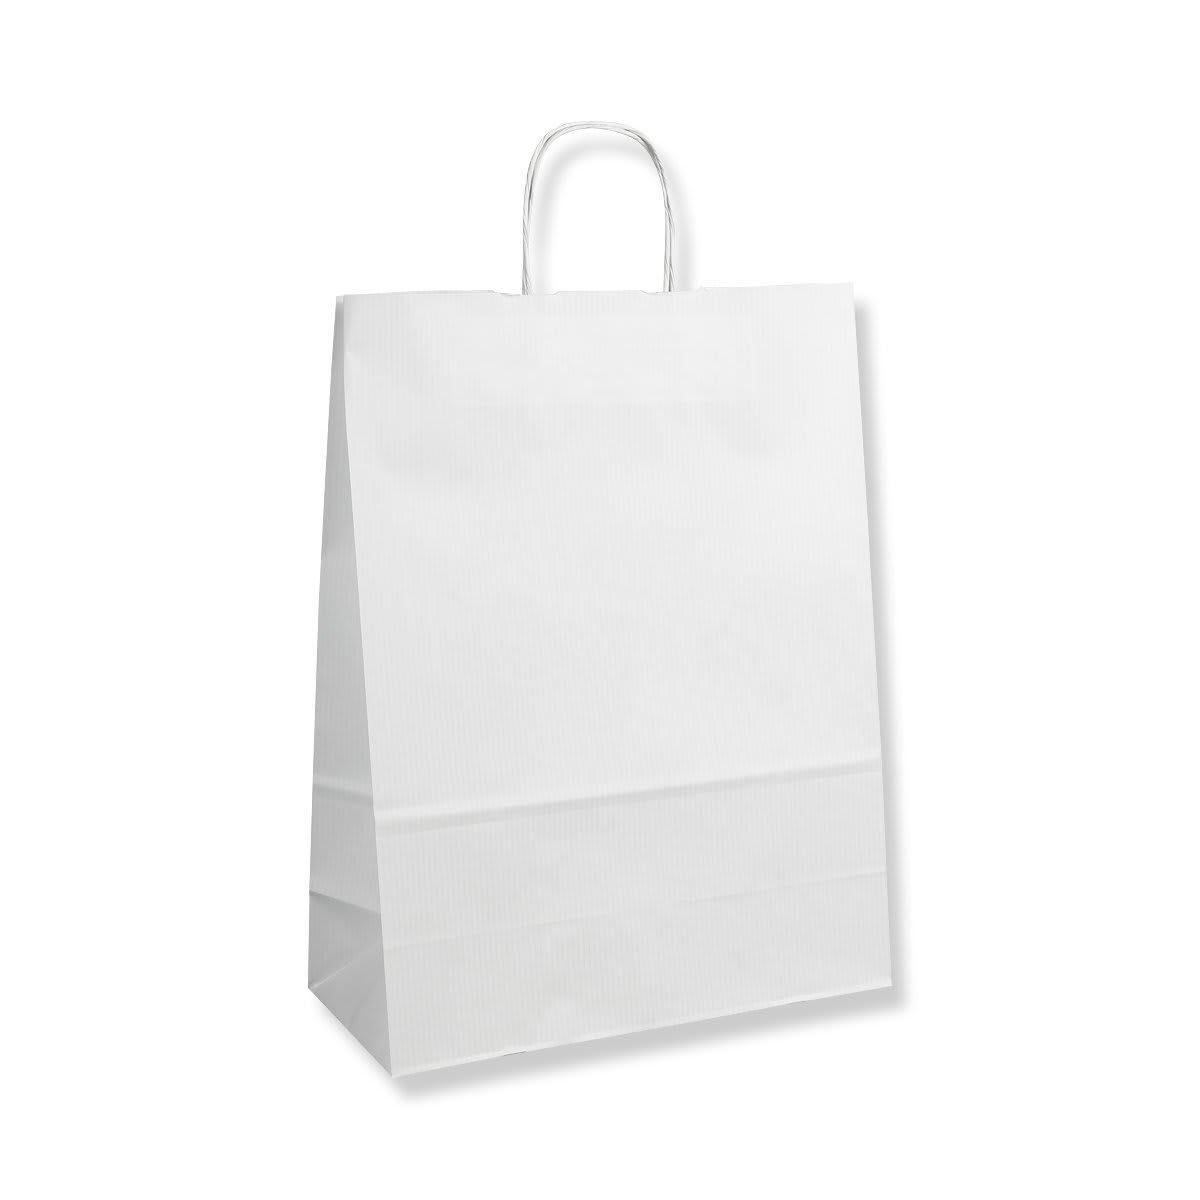 320x140x420mm WHITE TWIST HANDLED PAPER BAGS